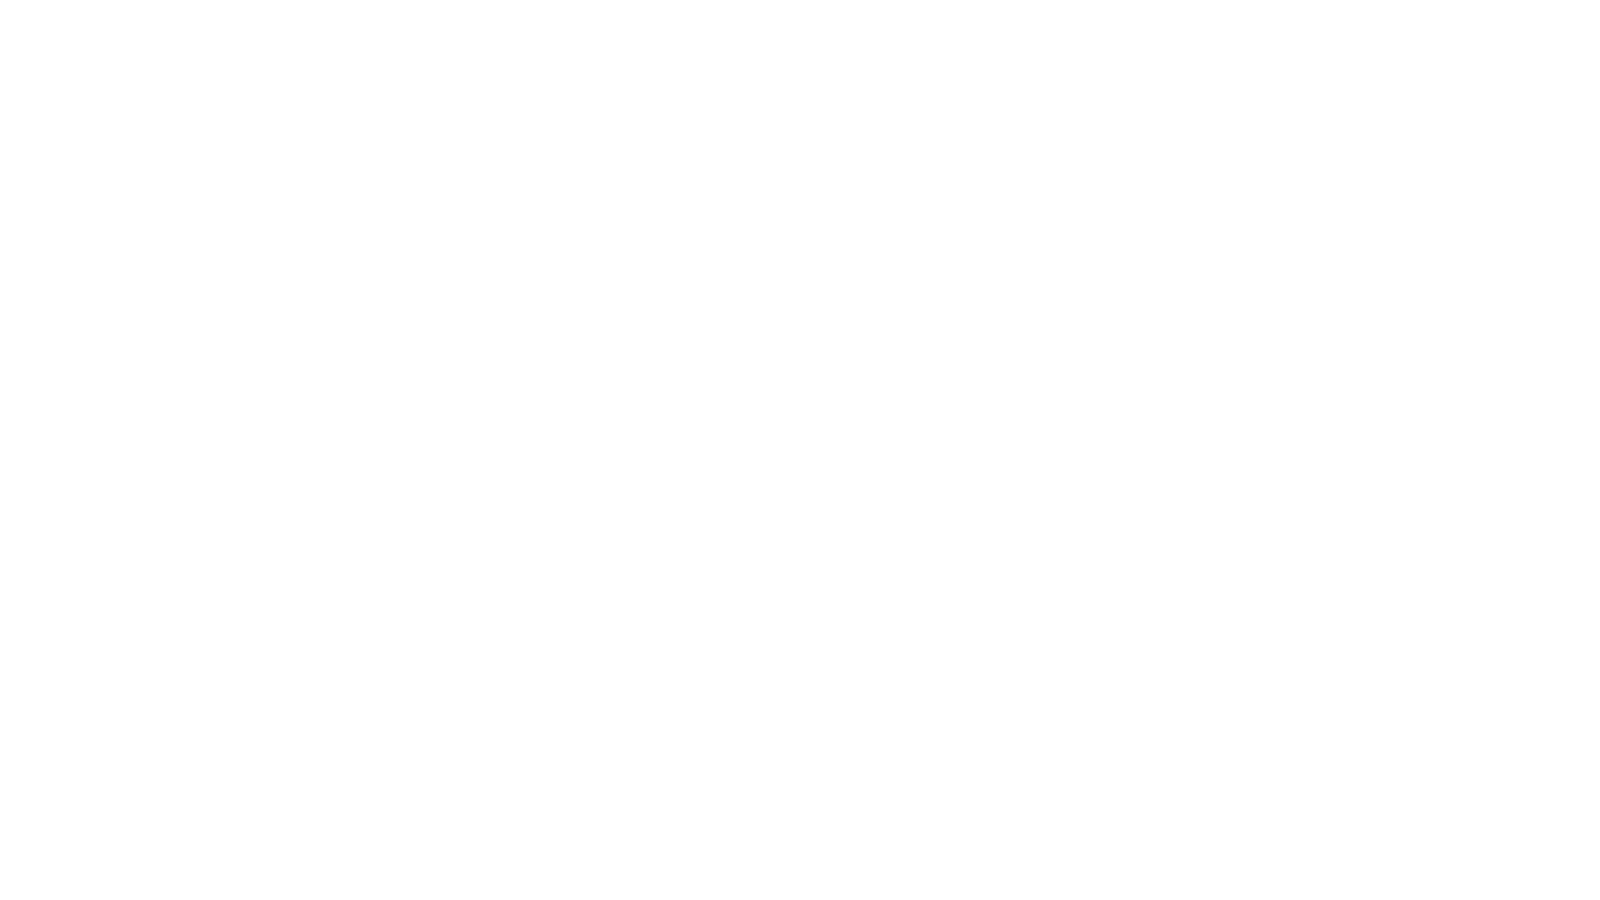 【LINE限定特典】※『再現性97%成果実証済みのノウハウ』を期間限定で配布中↓ https://kurohata.com/dpto  ①『再現性97%成果実証済みのノウハウ』講座 ②90分で10万円のノウハウ ③アフィリエイト完全マニュアル ④たった10記事でGoogleAdSenseを通す方法  チャンネル登録お願い致します!↓ https://www.youtube.com/channel/UC7MBDeBibEoZc8FbWbcEirw  僕のBLOGはこちら↓ https://kurohata.com/  Twitter↓ https://twitter.com/hayatobloger  Instagram↓ https://www.instagram.com/kurohatabloger/channel/?hl=ja   僕が脱サラするまでにしてきた事↓ https://kurohata.com/datsusara/  僕の毎月の収益はこちら↓ https://kurohata.com/category/earning/   #アフィリエイト #ブログアフィリエイト #ブログ